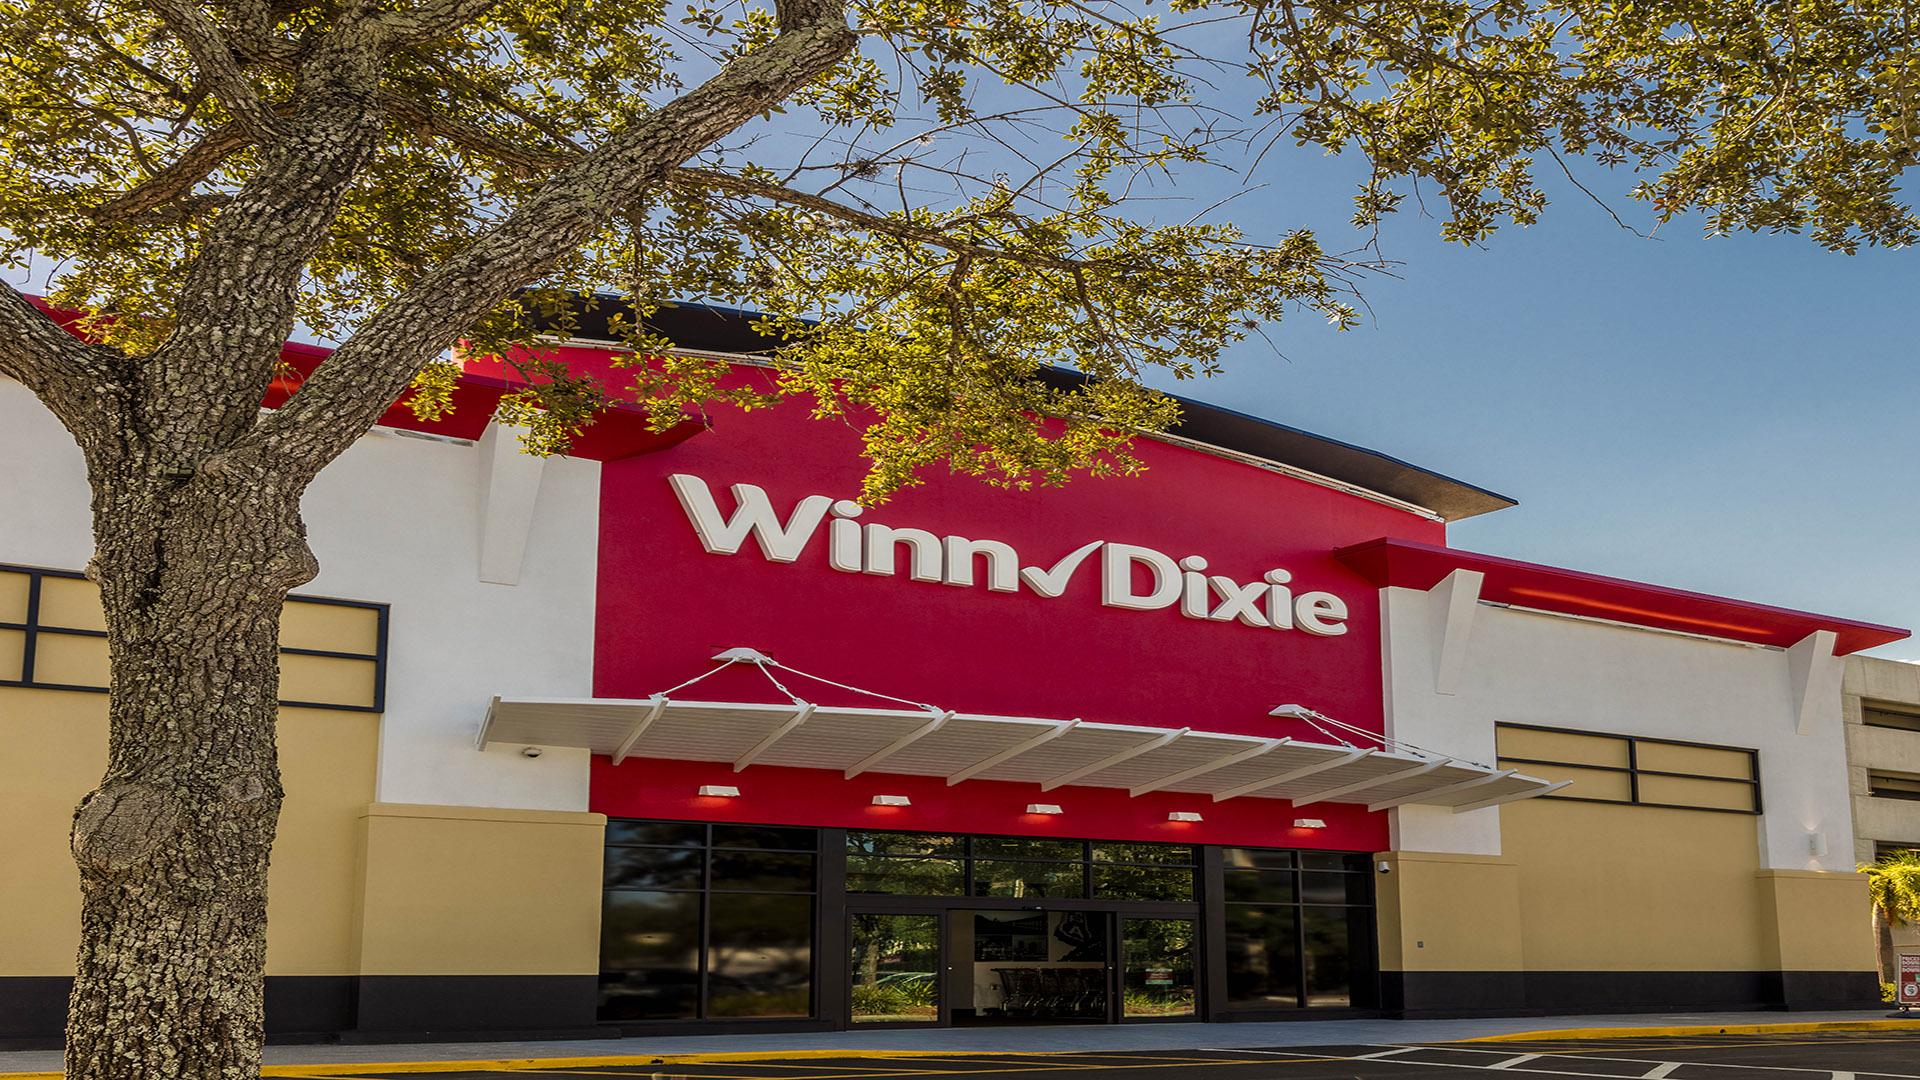 Winn Dixie Christmas Eve Hours 2020 Titusville Fl Winn Dixie announces new store hours to deal with coronavirus | WFLA